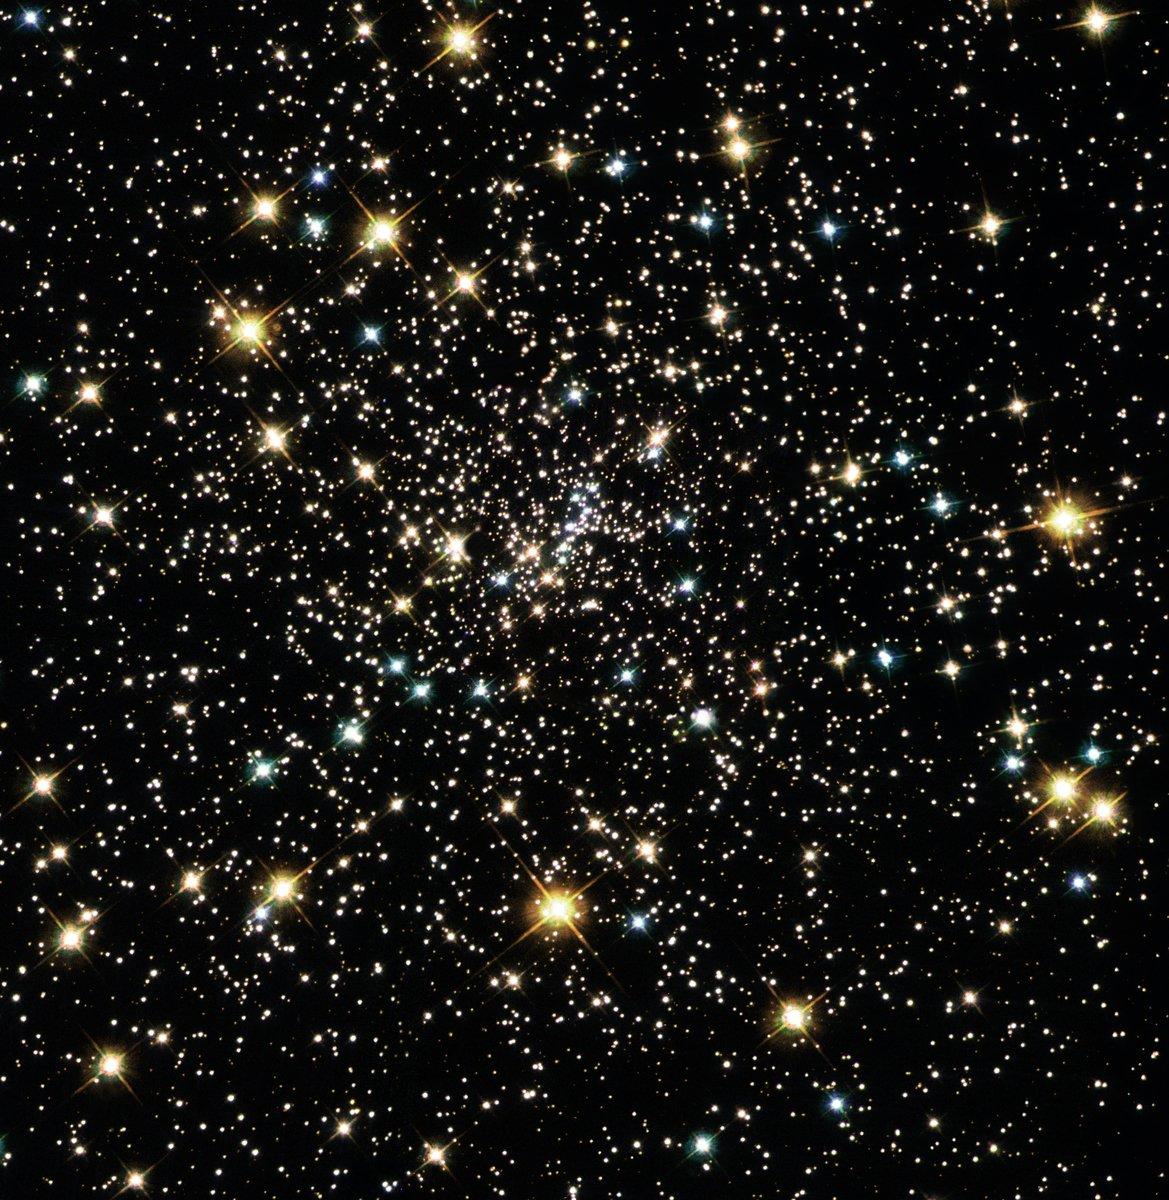 球狀星團NGC 6397的哈勃照片。(NASA/ESA and the Hubble Heritage Team(AURA/STScI))